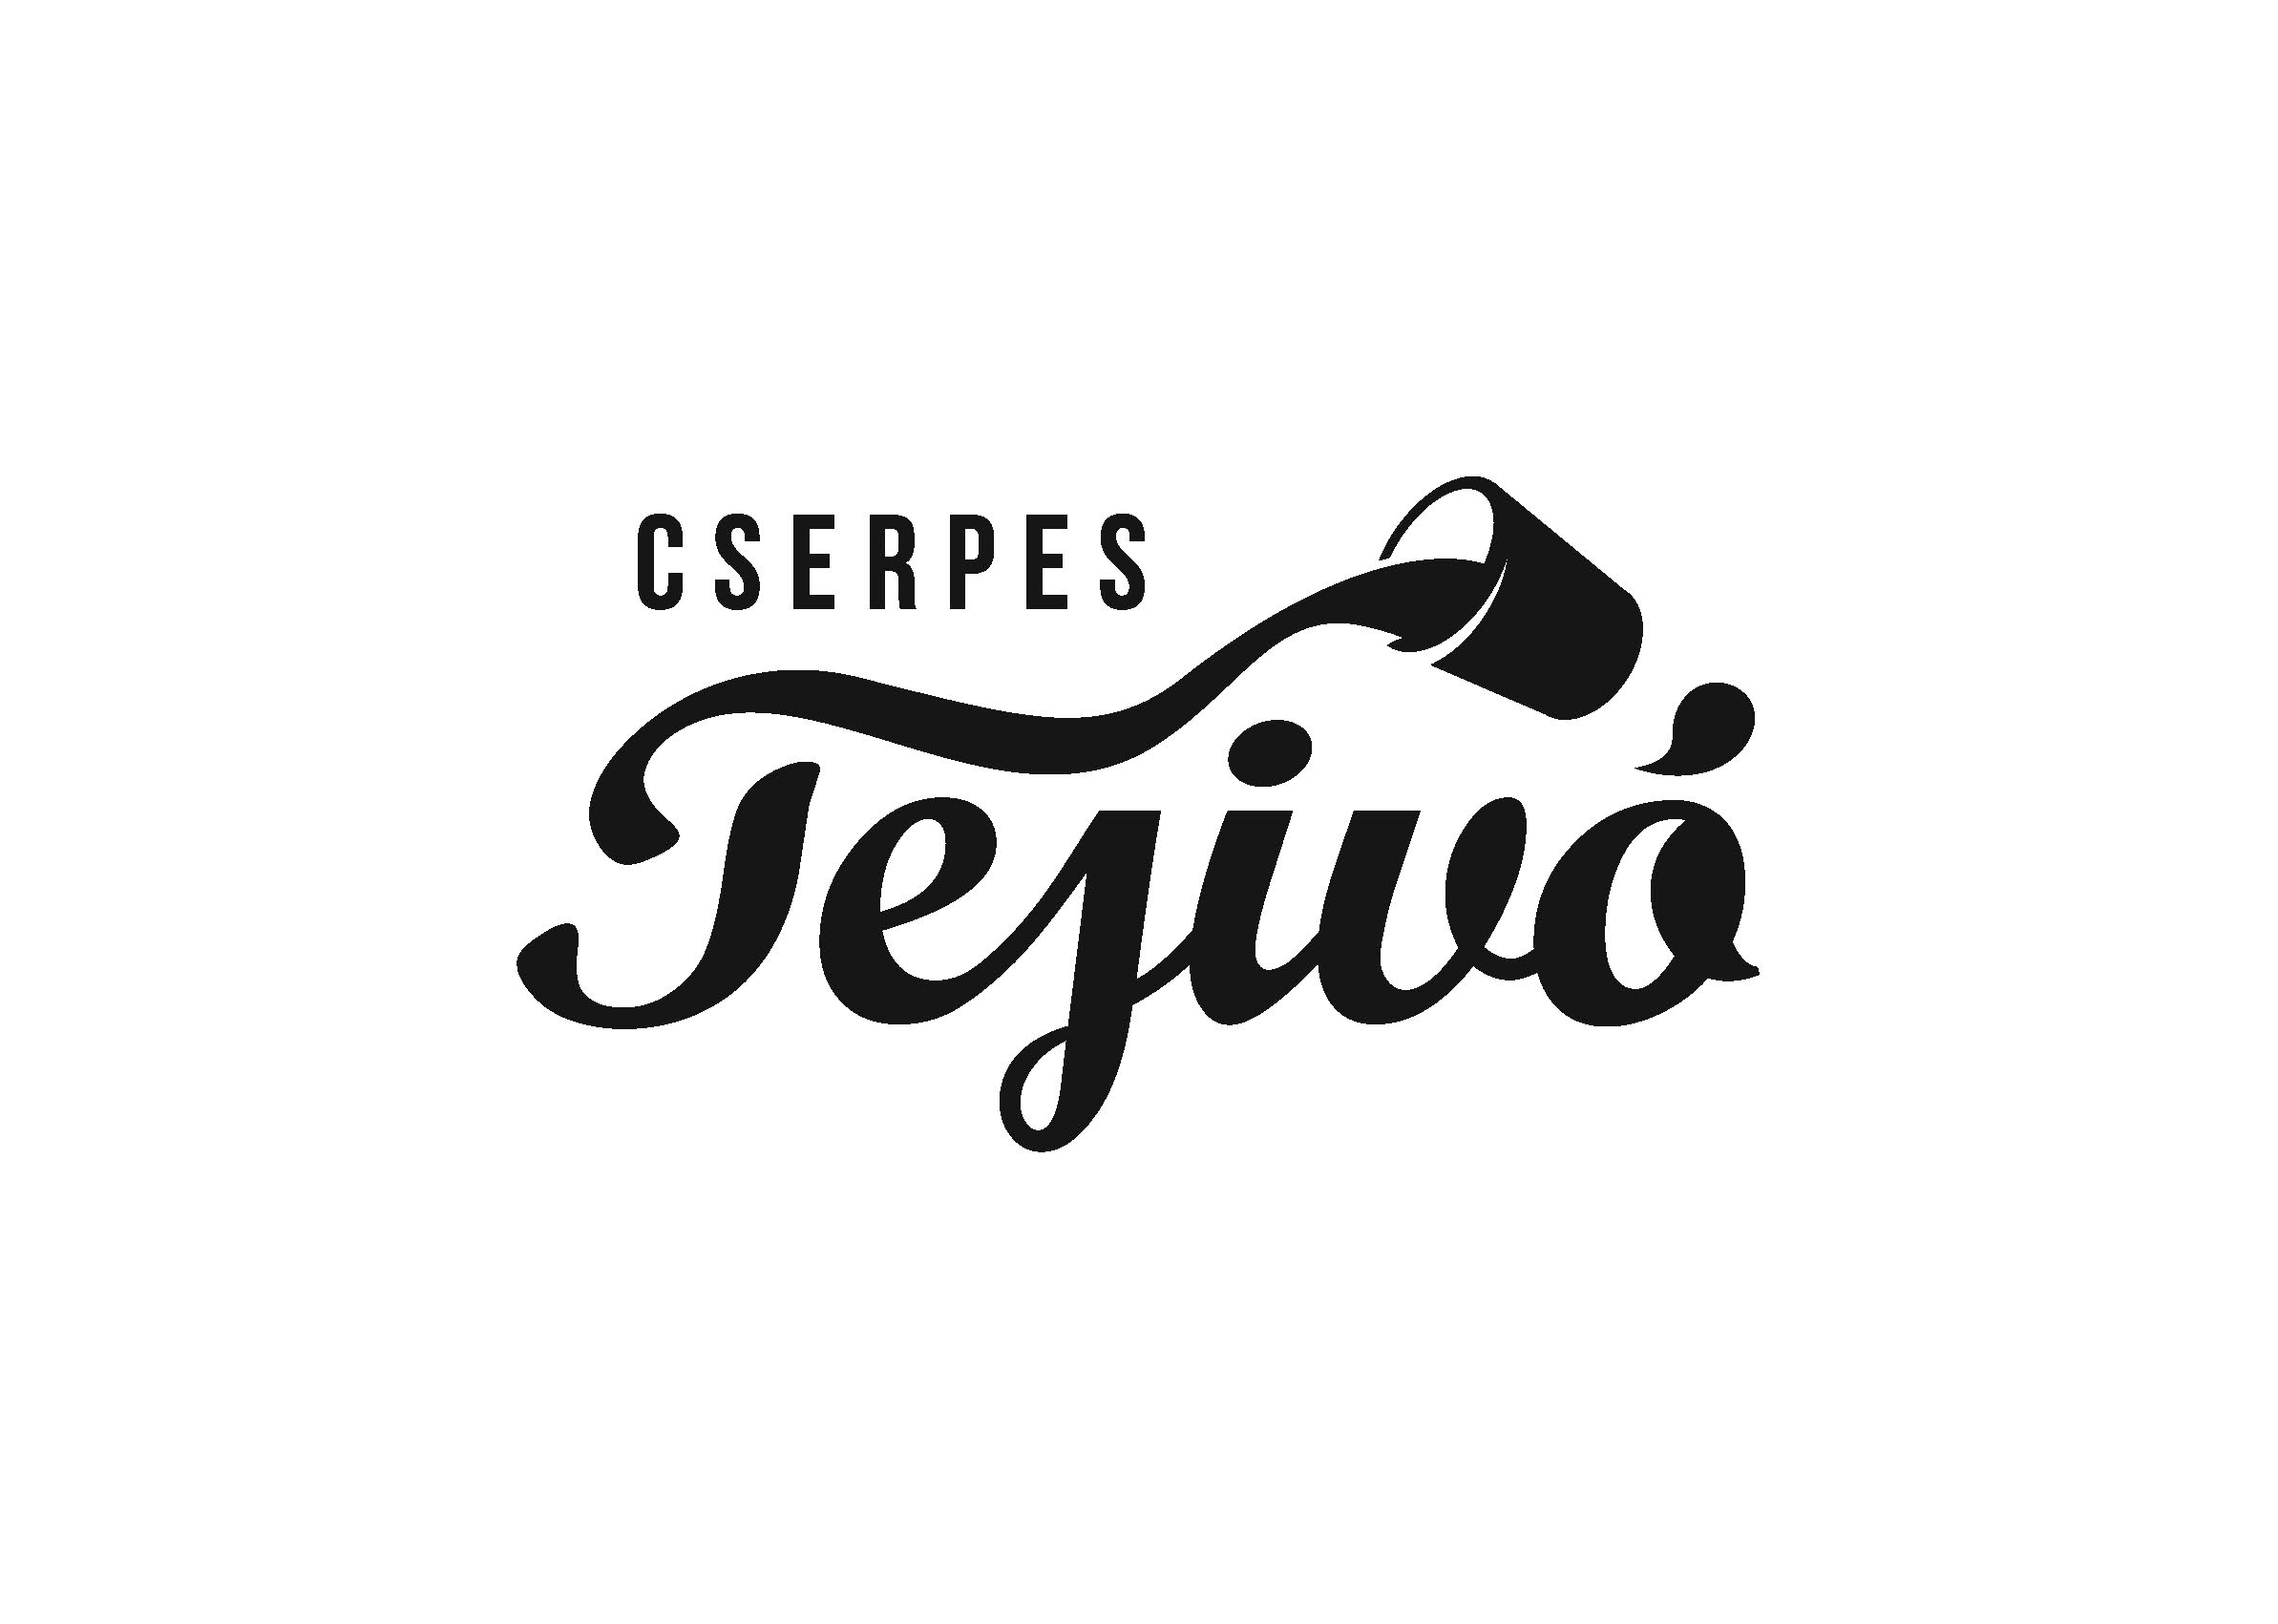 Cserpes_tejivo_logo